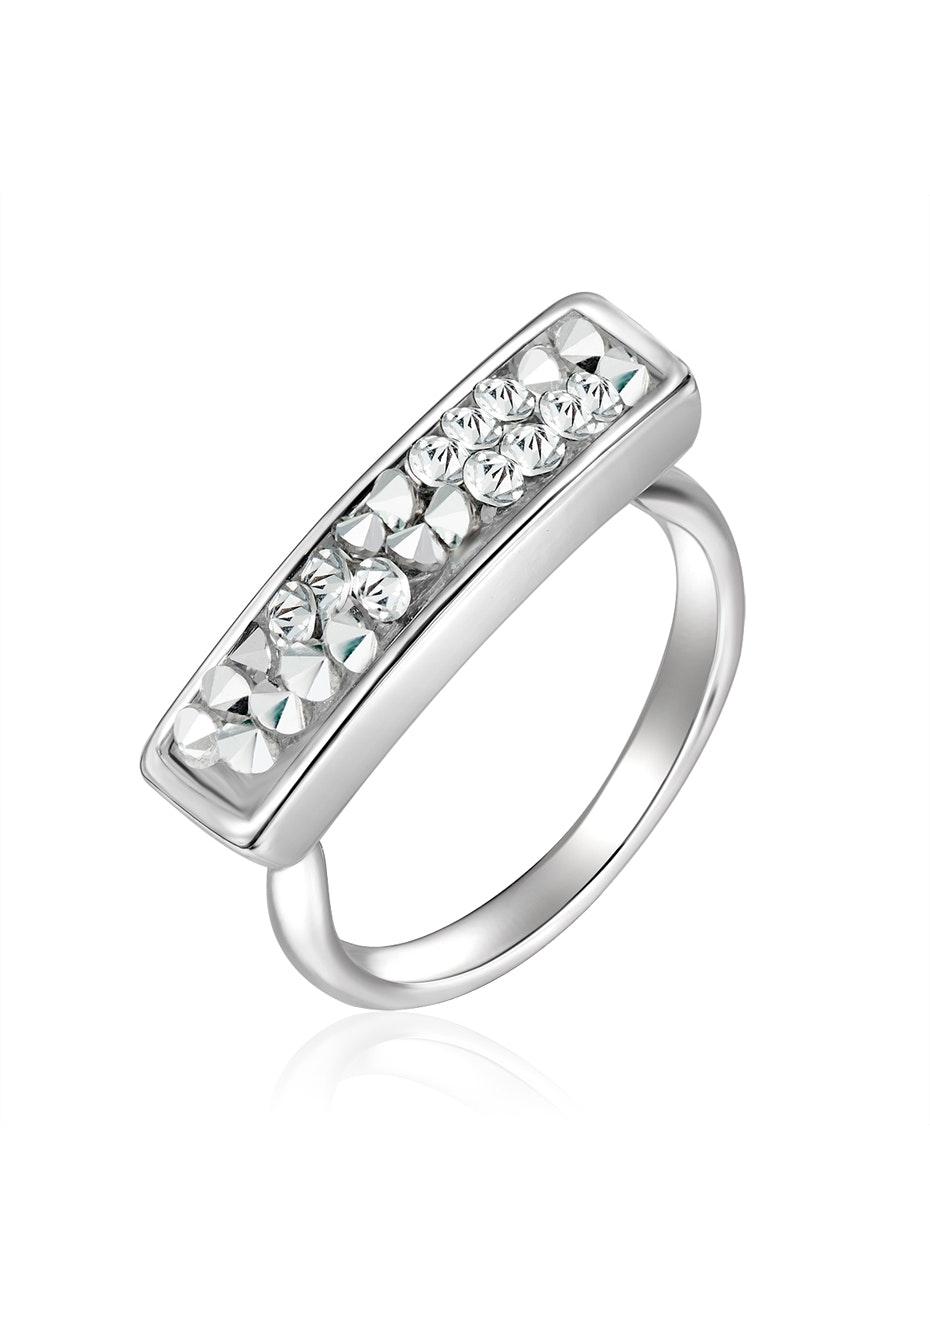 Prestige Ring Ft Swarovski Crystals